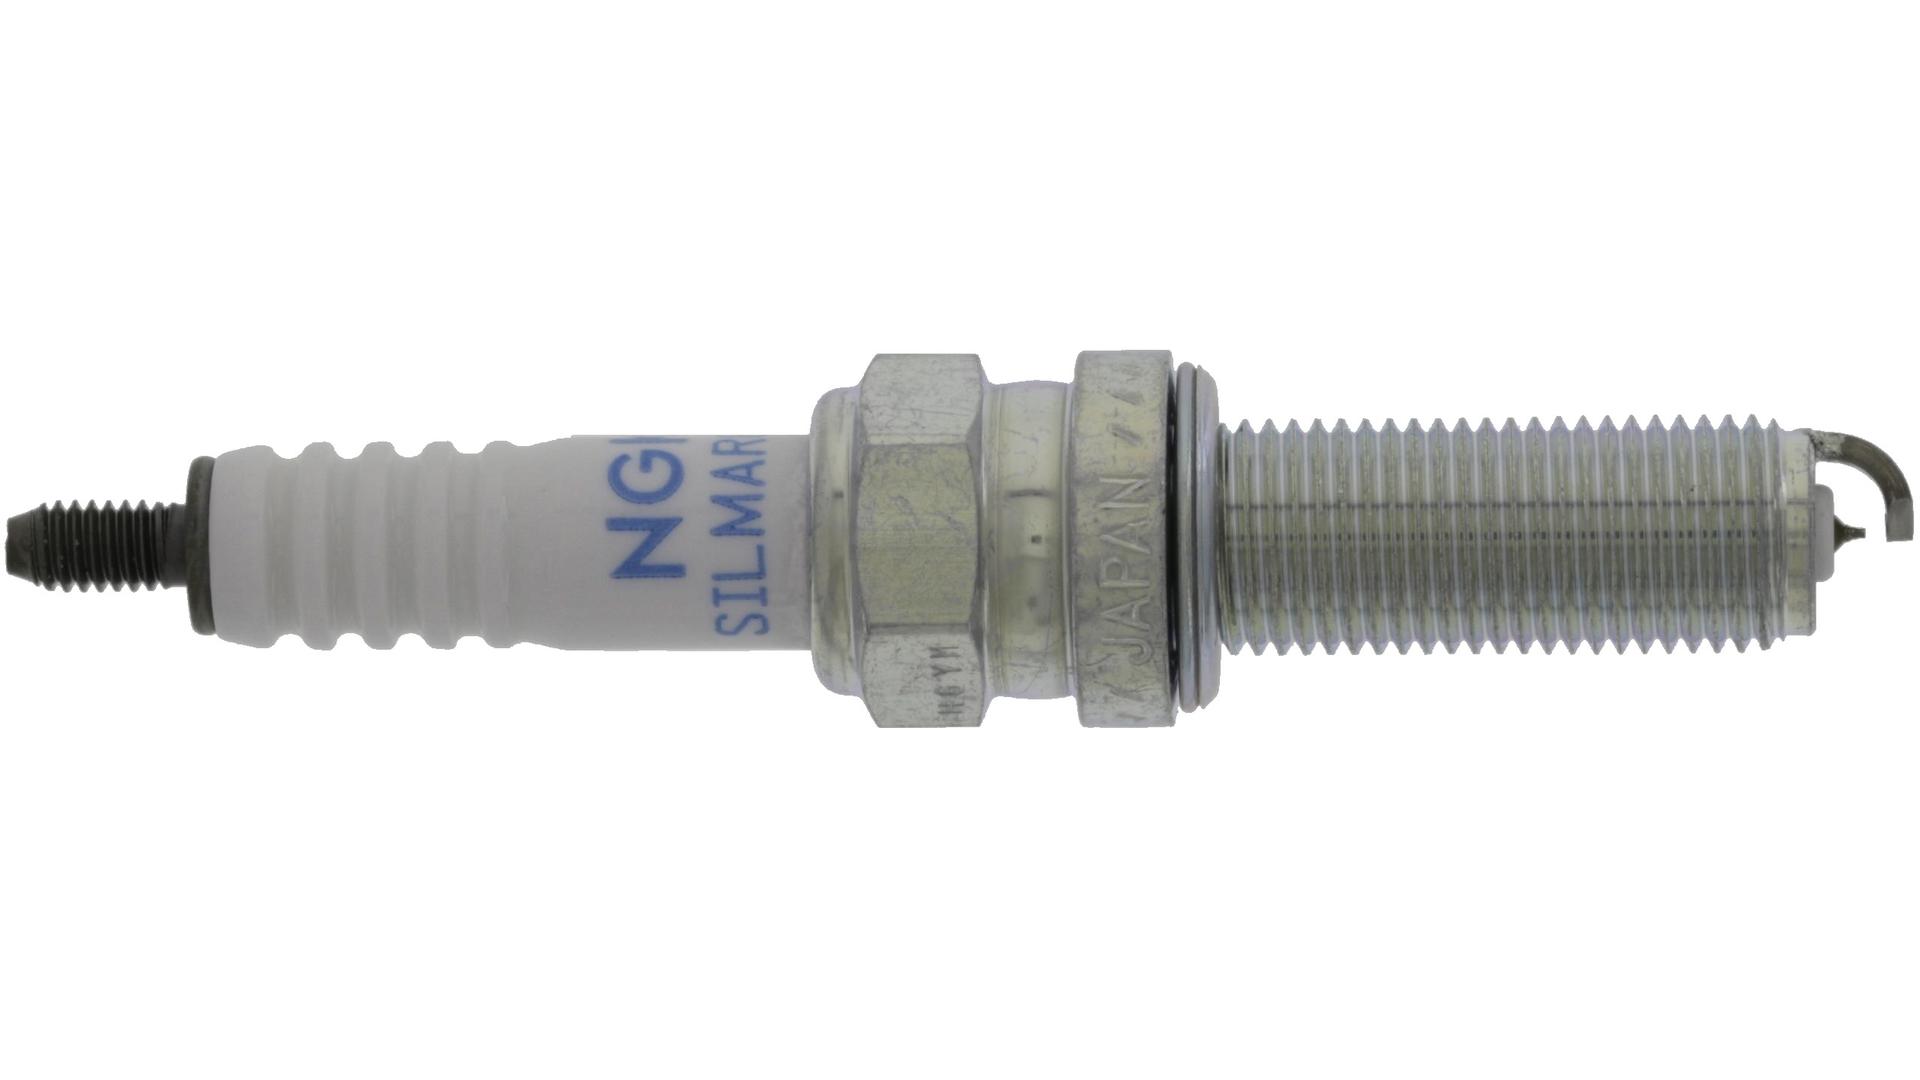 Zündkerze NGK DPR8EIX-9 IRIDIUM mit Zündkerzenschlüssel Steck Nuss magnetisch